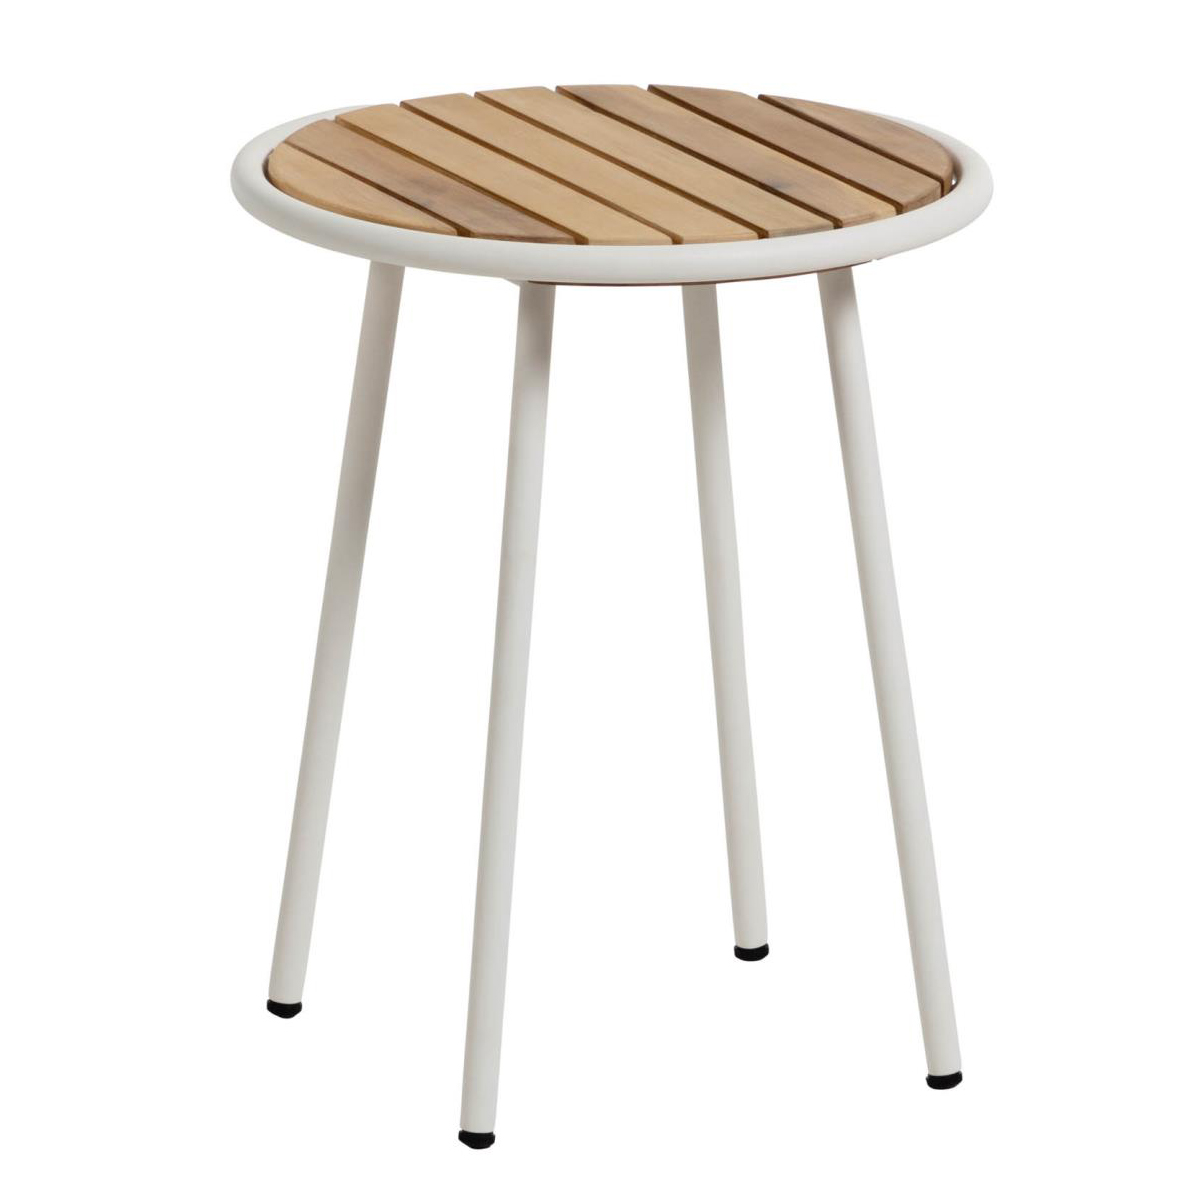 Table en lattes d'acacia massif (Bois)